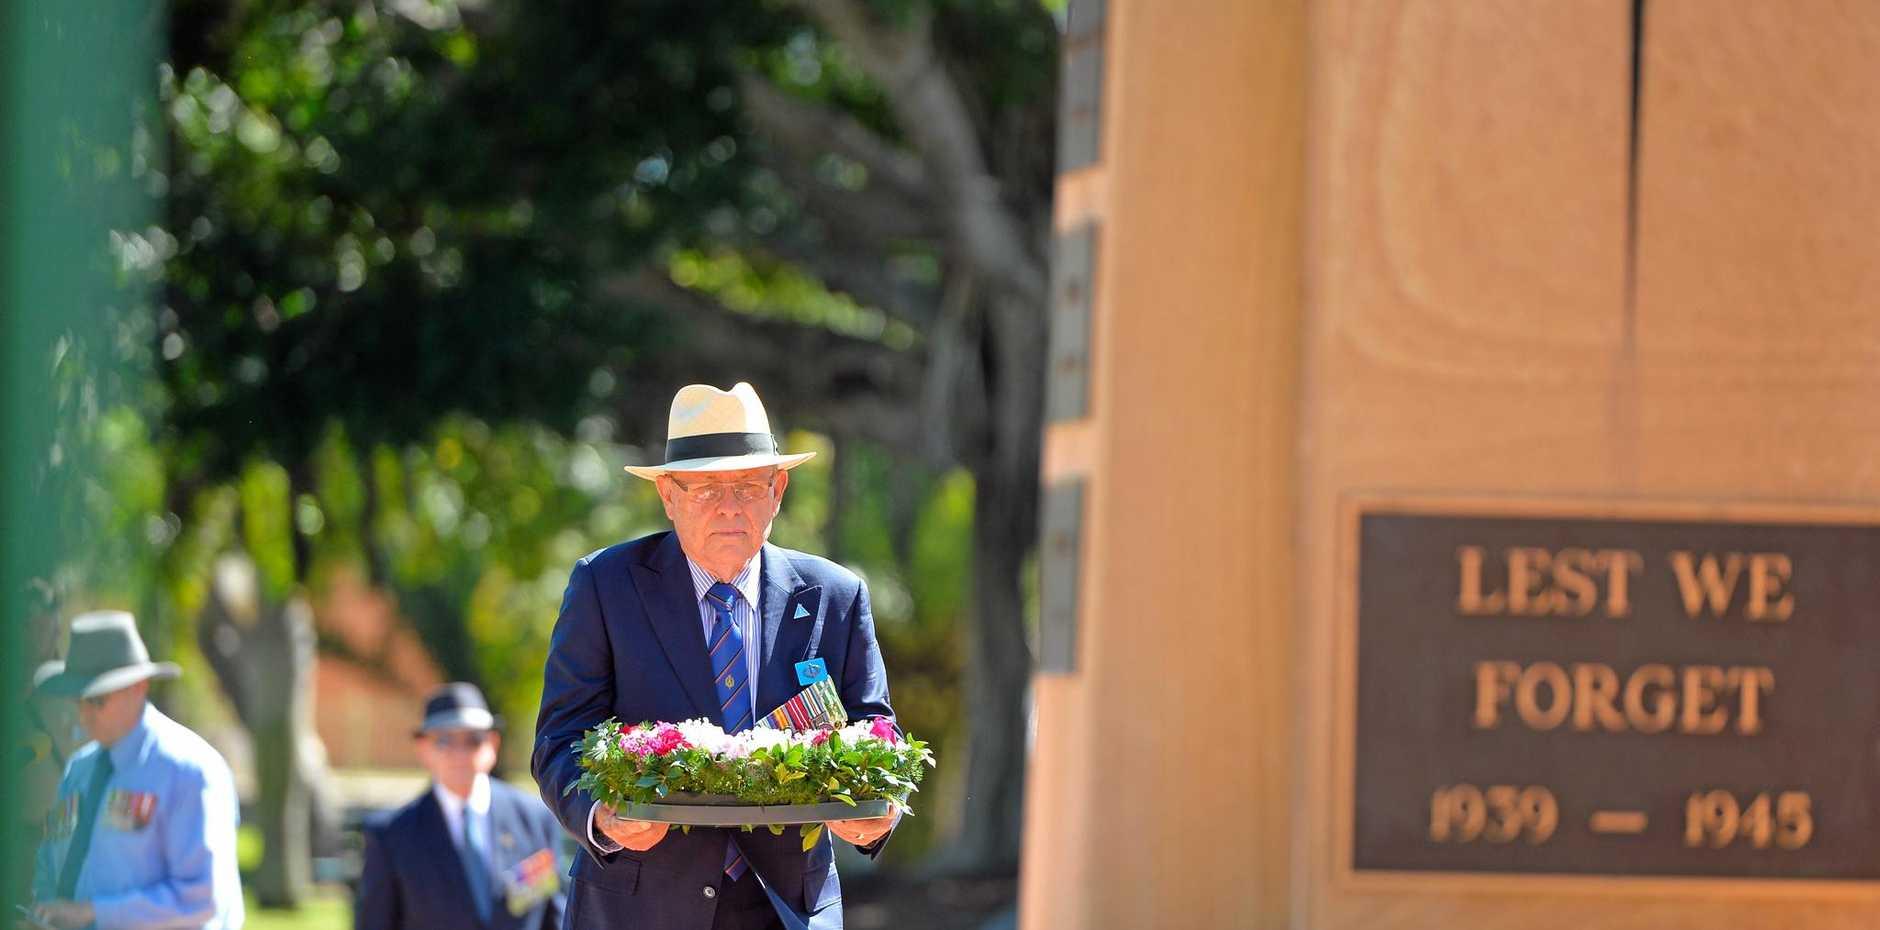 LEST WE FORGET: Vietnam Veterans Day - Anzac Park, Gladstone - August 18, 2017.